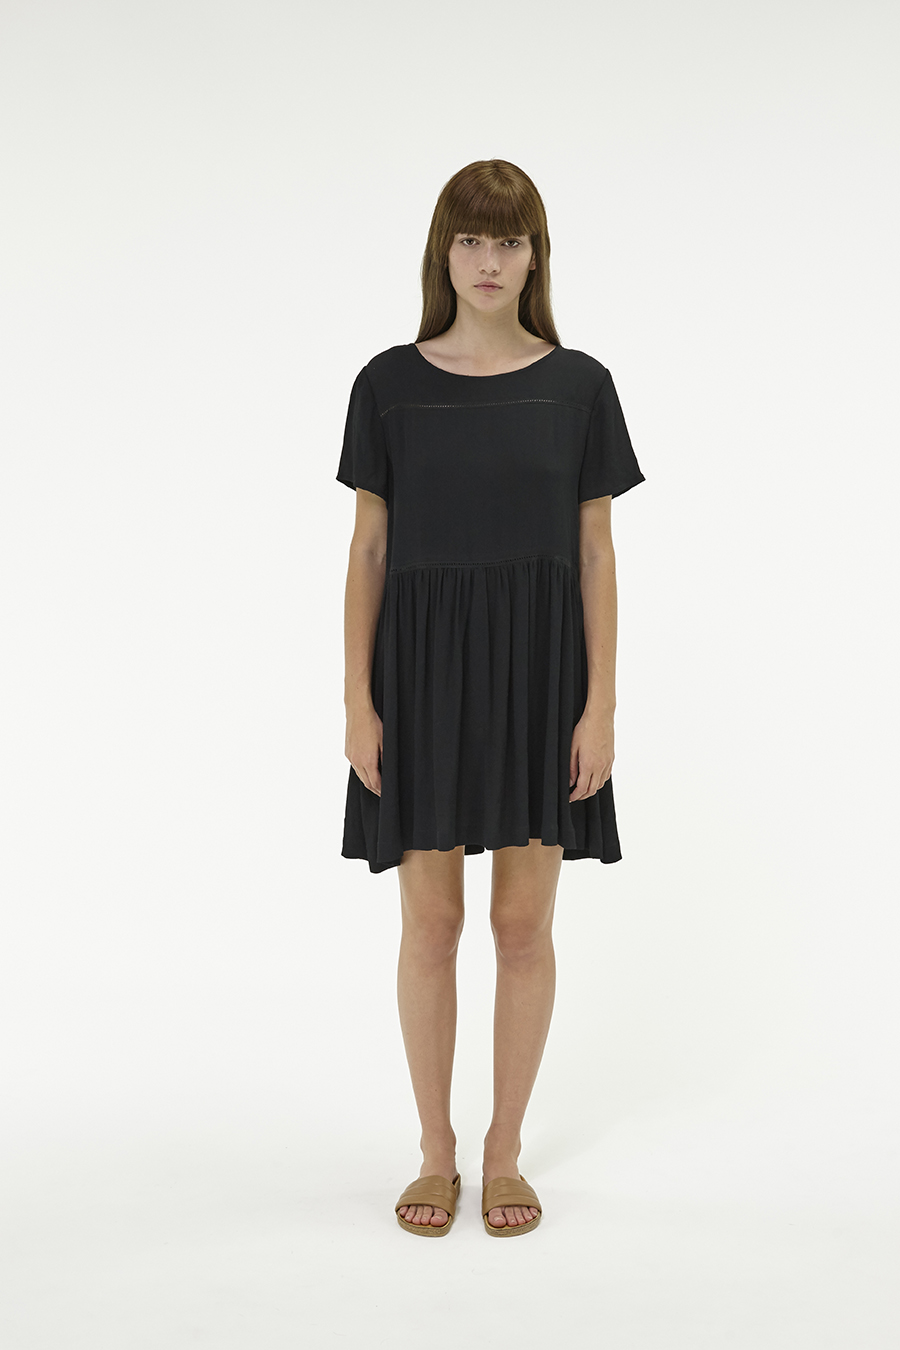 Huffer_Q3-16_W-Park-Dress_Black-01